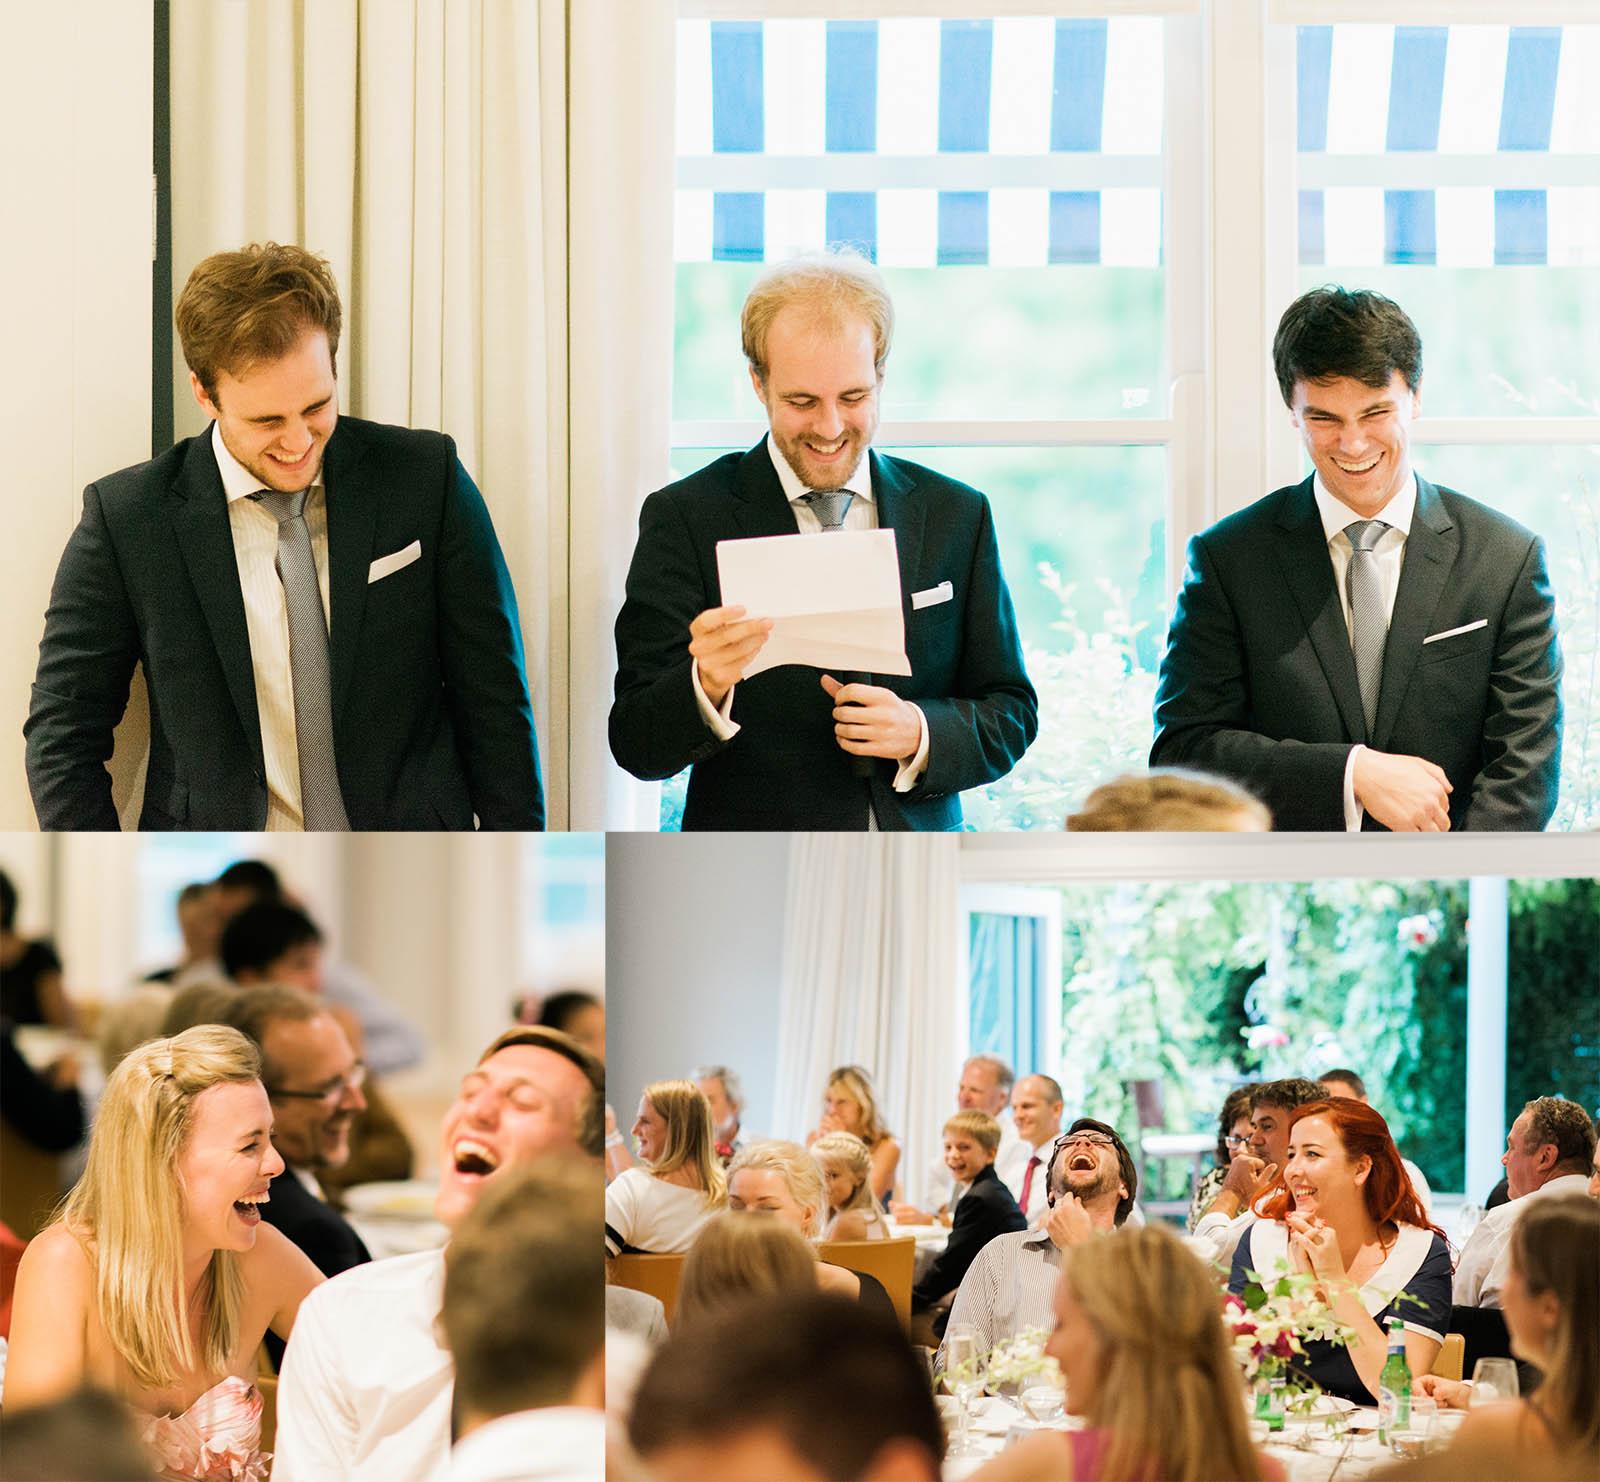 Really Good Wedding Speech